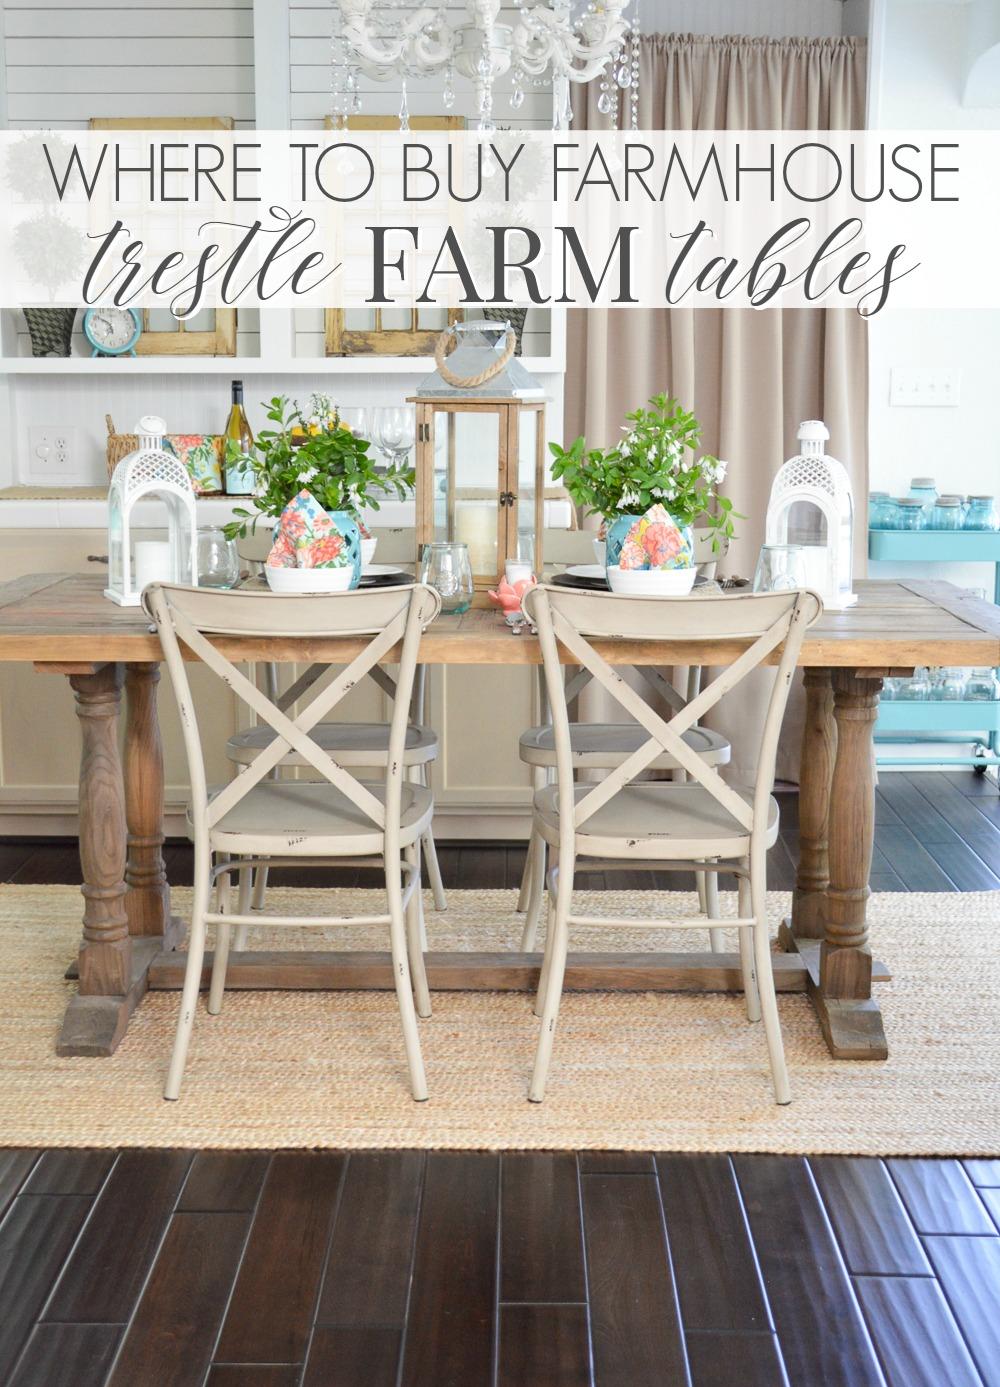 Where To Buy A Farmhouse Trestle Style Farm Table - Fox Hollow Cottage